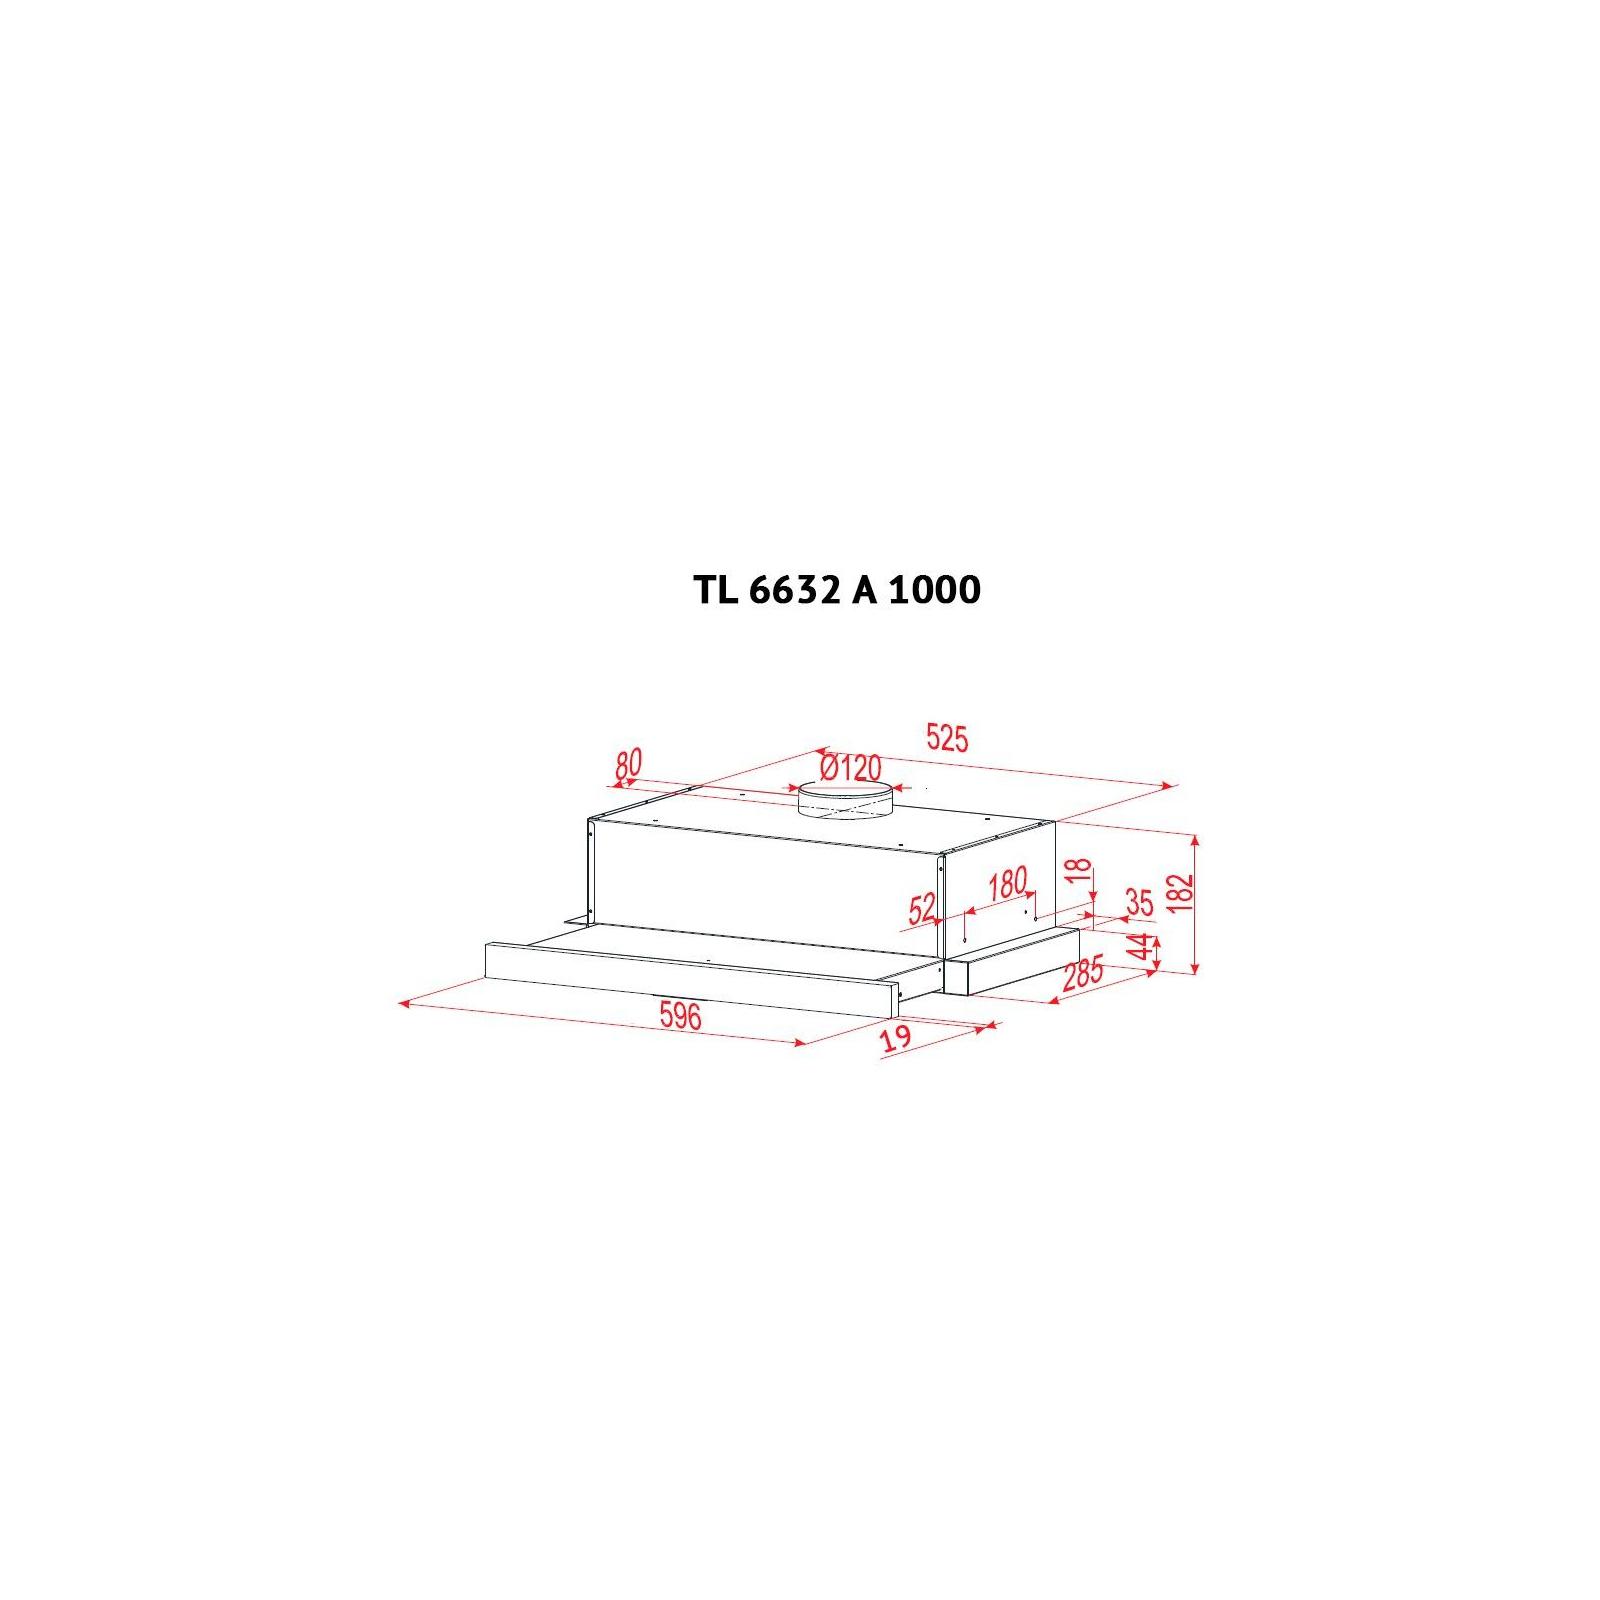 Вытяжка кухонная PERFELLI TL 6632 A 1000 BL GLASS изображение 8